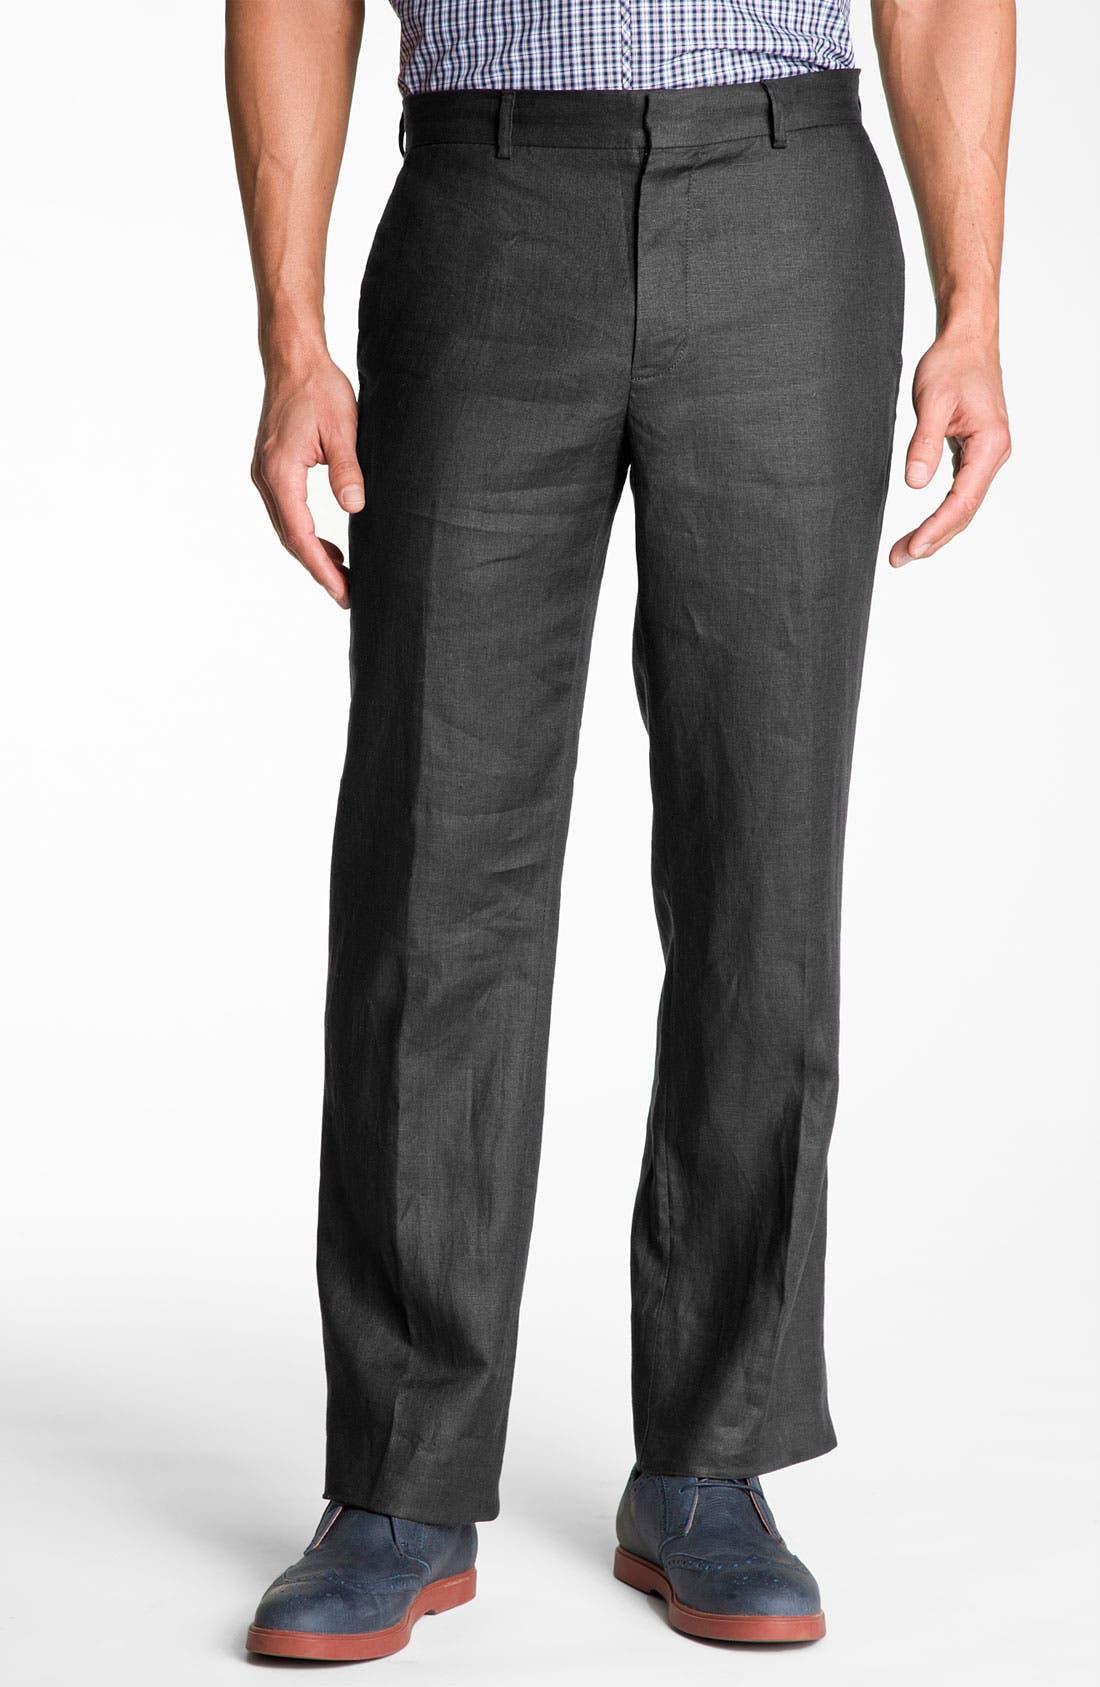 MICHAEL KORS,                             'Classic' Linen Pants,                             Main thumbnail 1, color,                             024